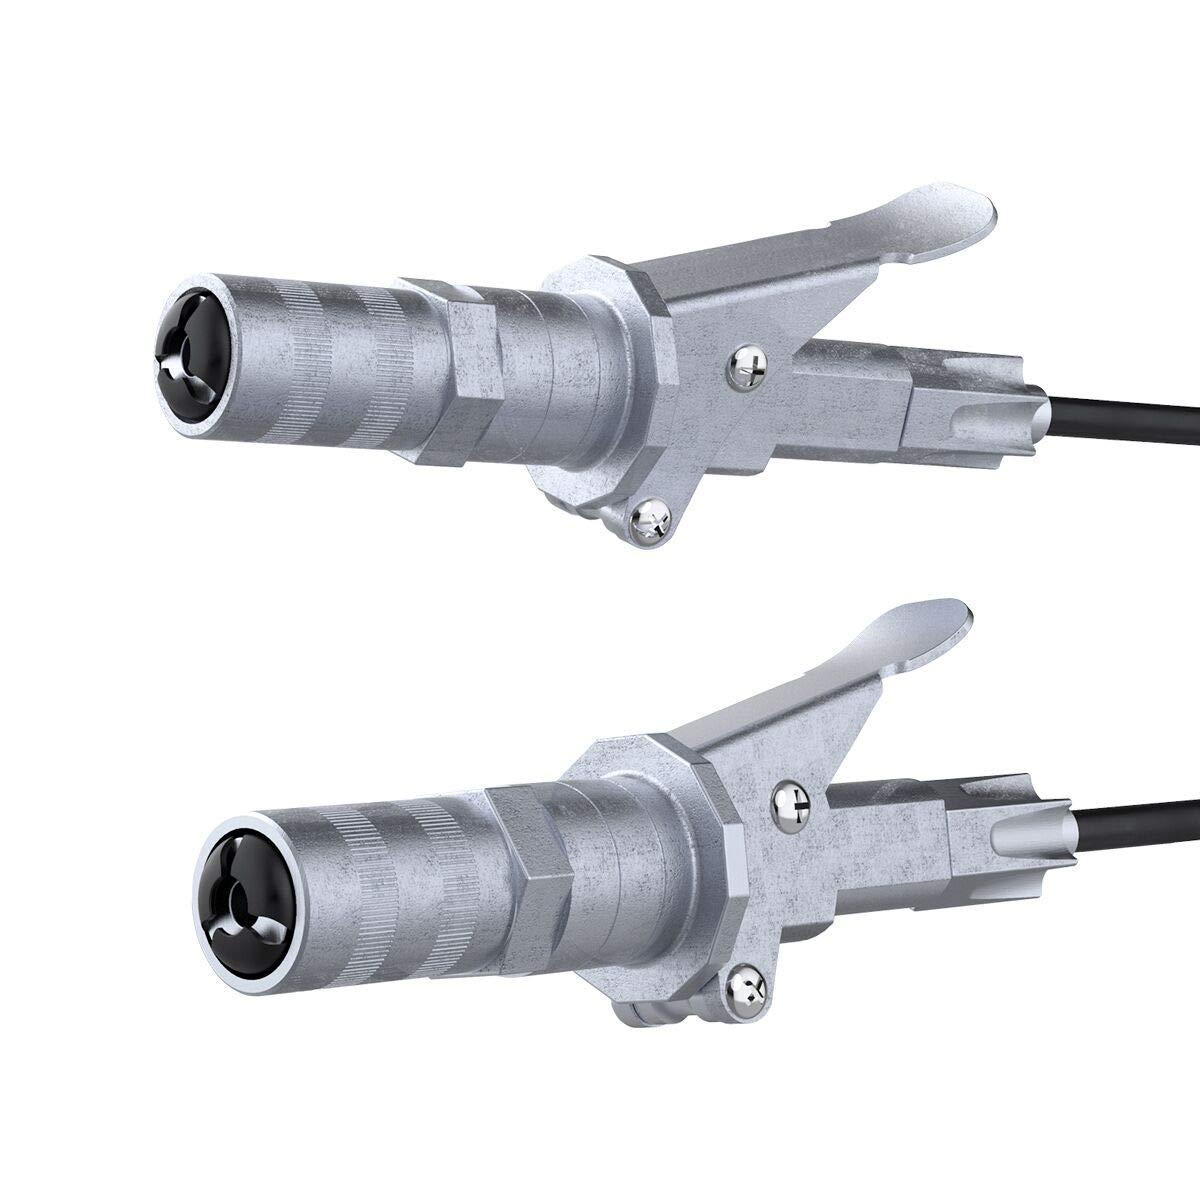 JoyTutus Grease Coupler Locks onto Zerk Fittings Rated 12,000 PSI 1/8 inch NPT Extended Grease Gun Coupler (Two Pack) by JoyTutus